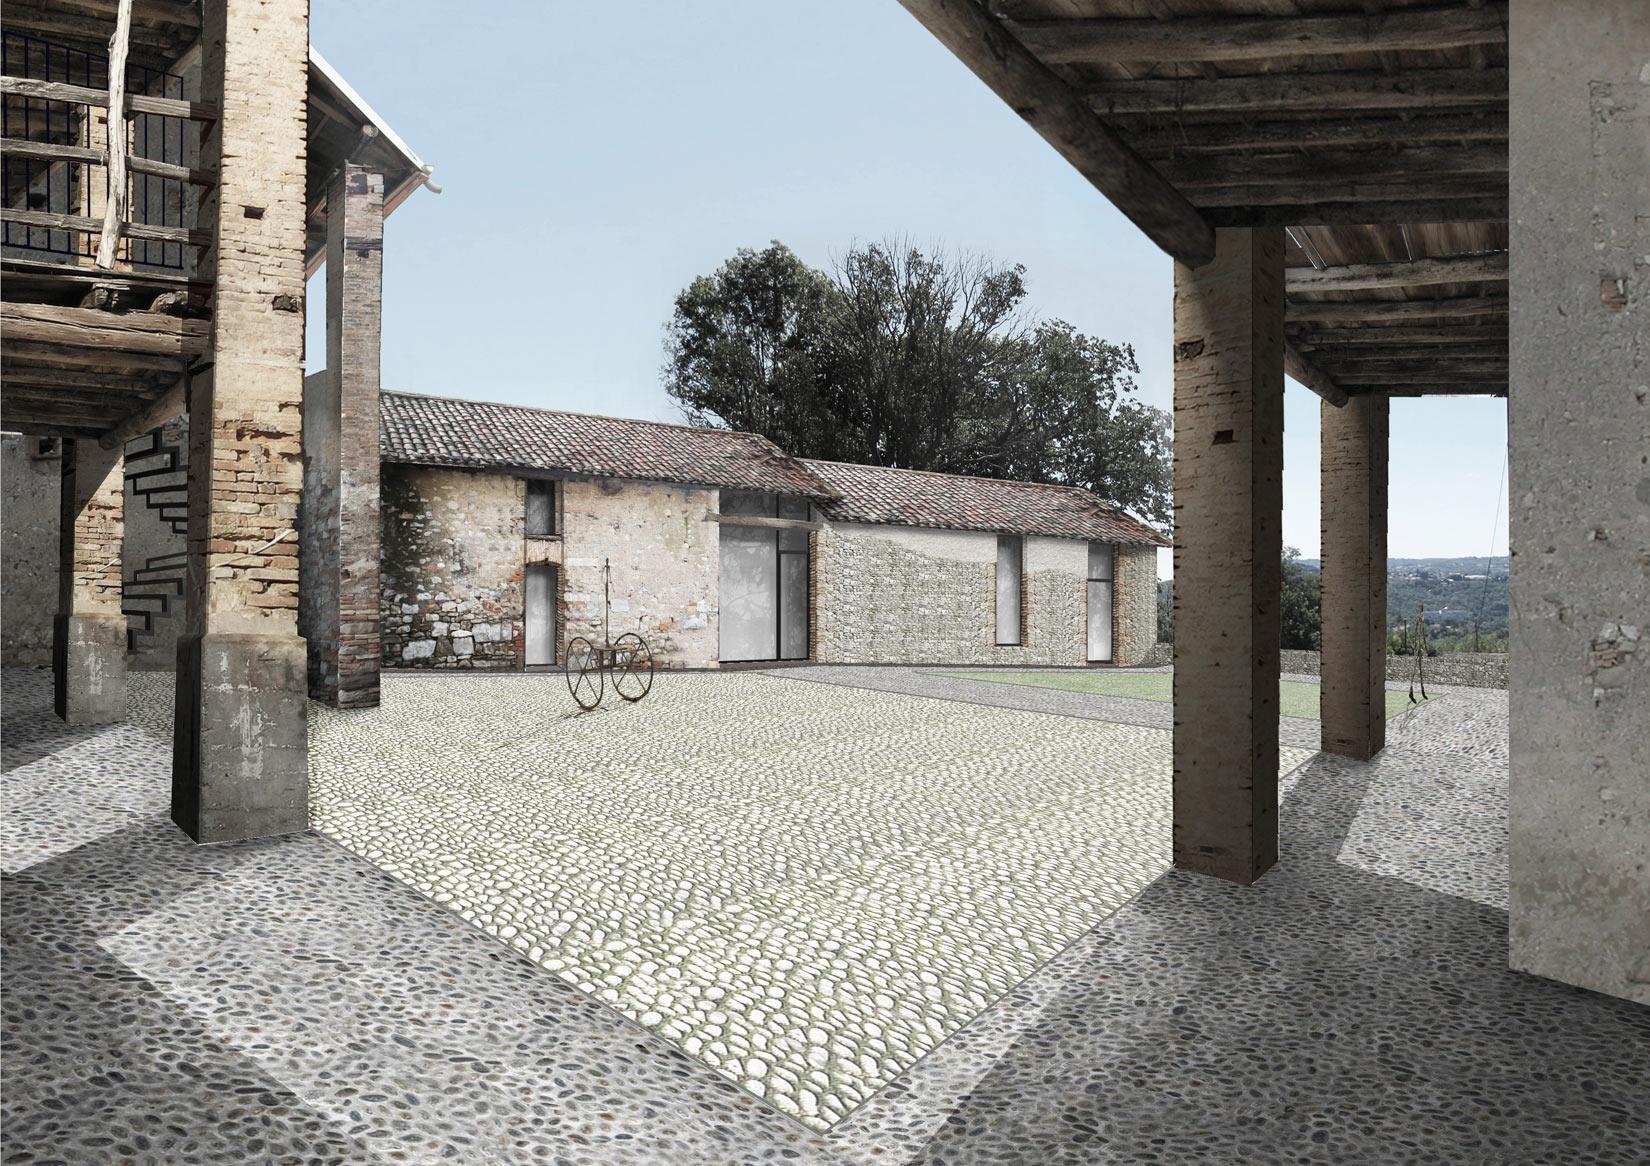 Restauro della masseria di Vigino, Castel San Pietro, studio arch. N. Baserga e C. Mozzetti, PANE E VINO